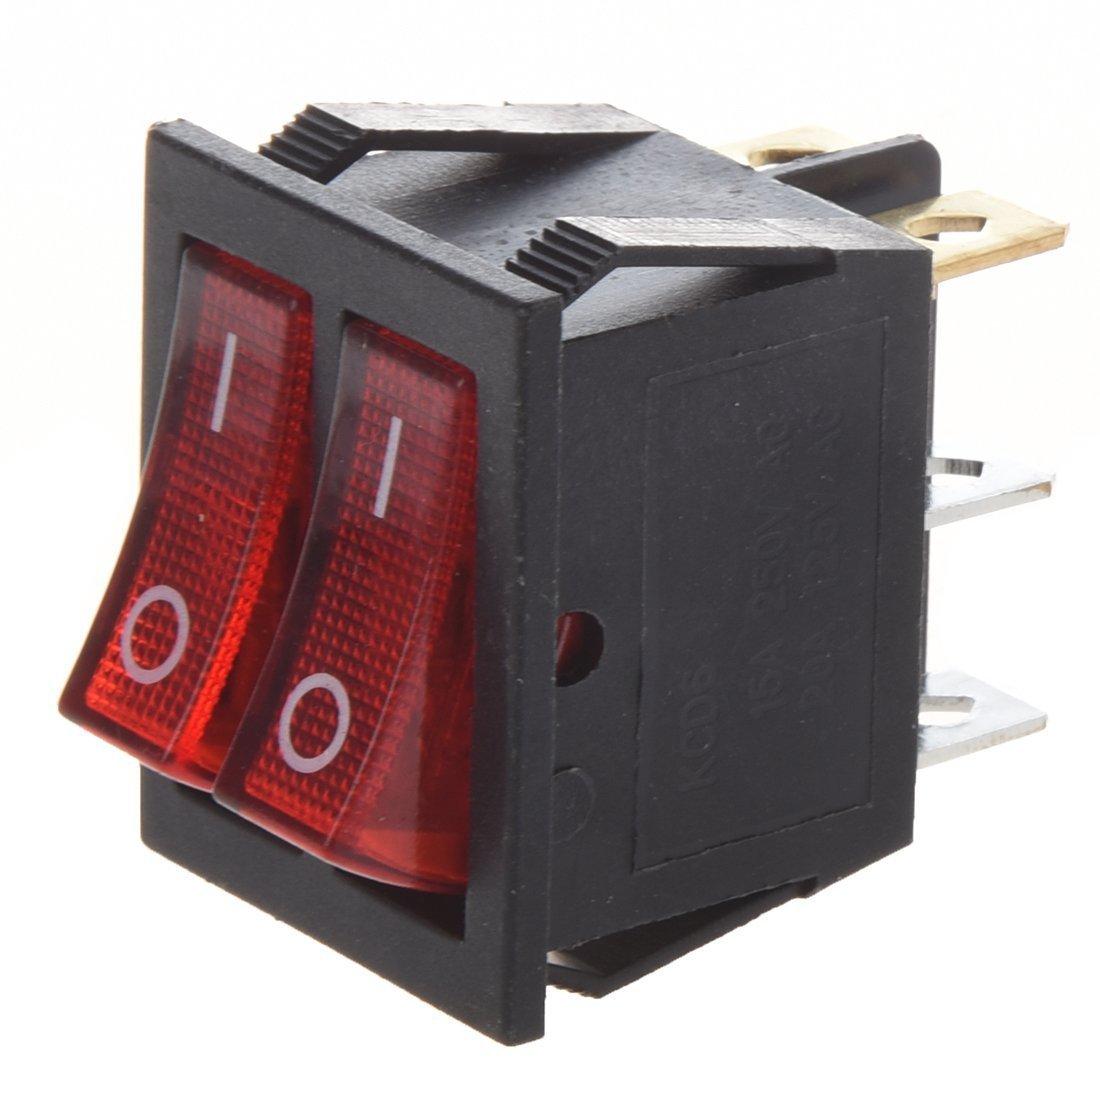 TOOGOO(R) Red Light Illuminated 6 Pin Dual SPST ON/OFF Boat Rocker Switch AC 15A/250V 20A/125V